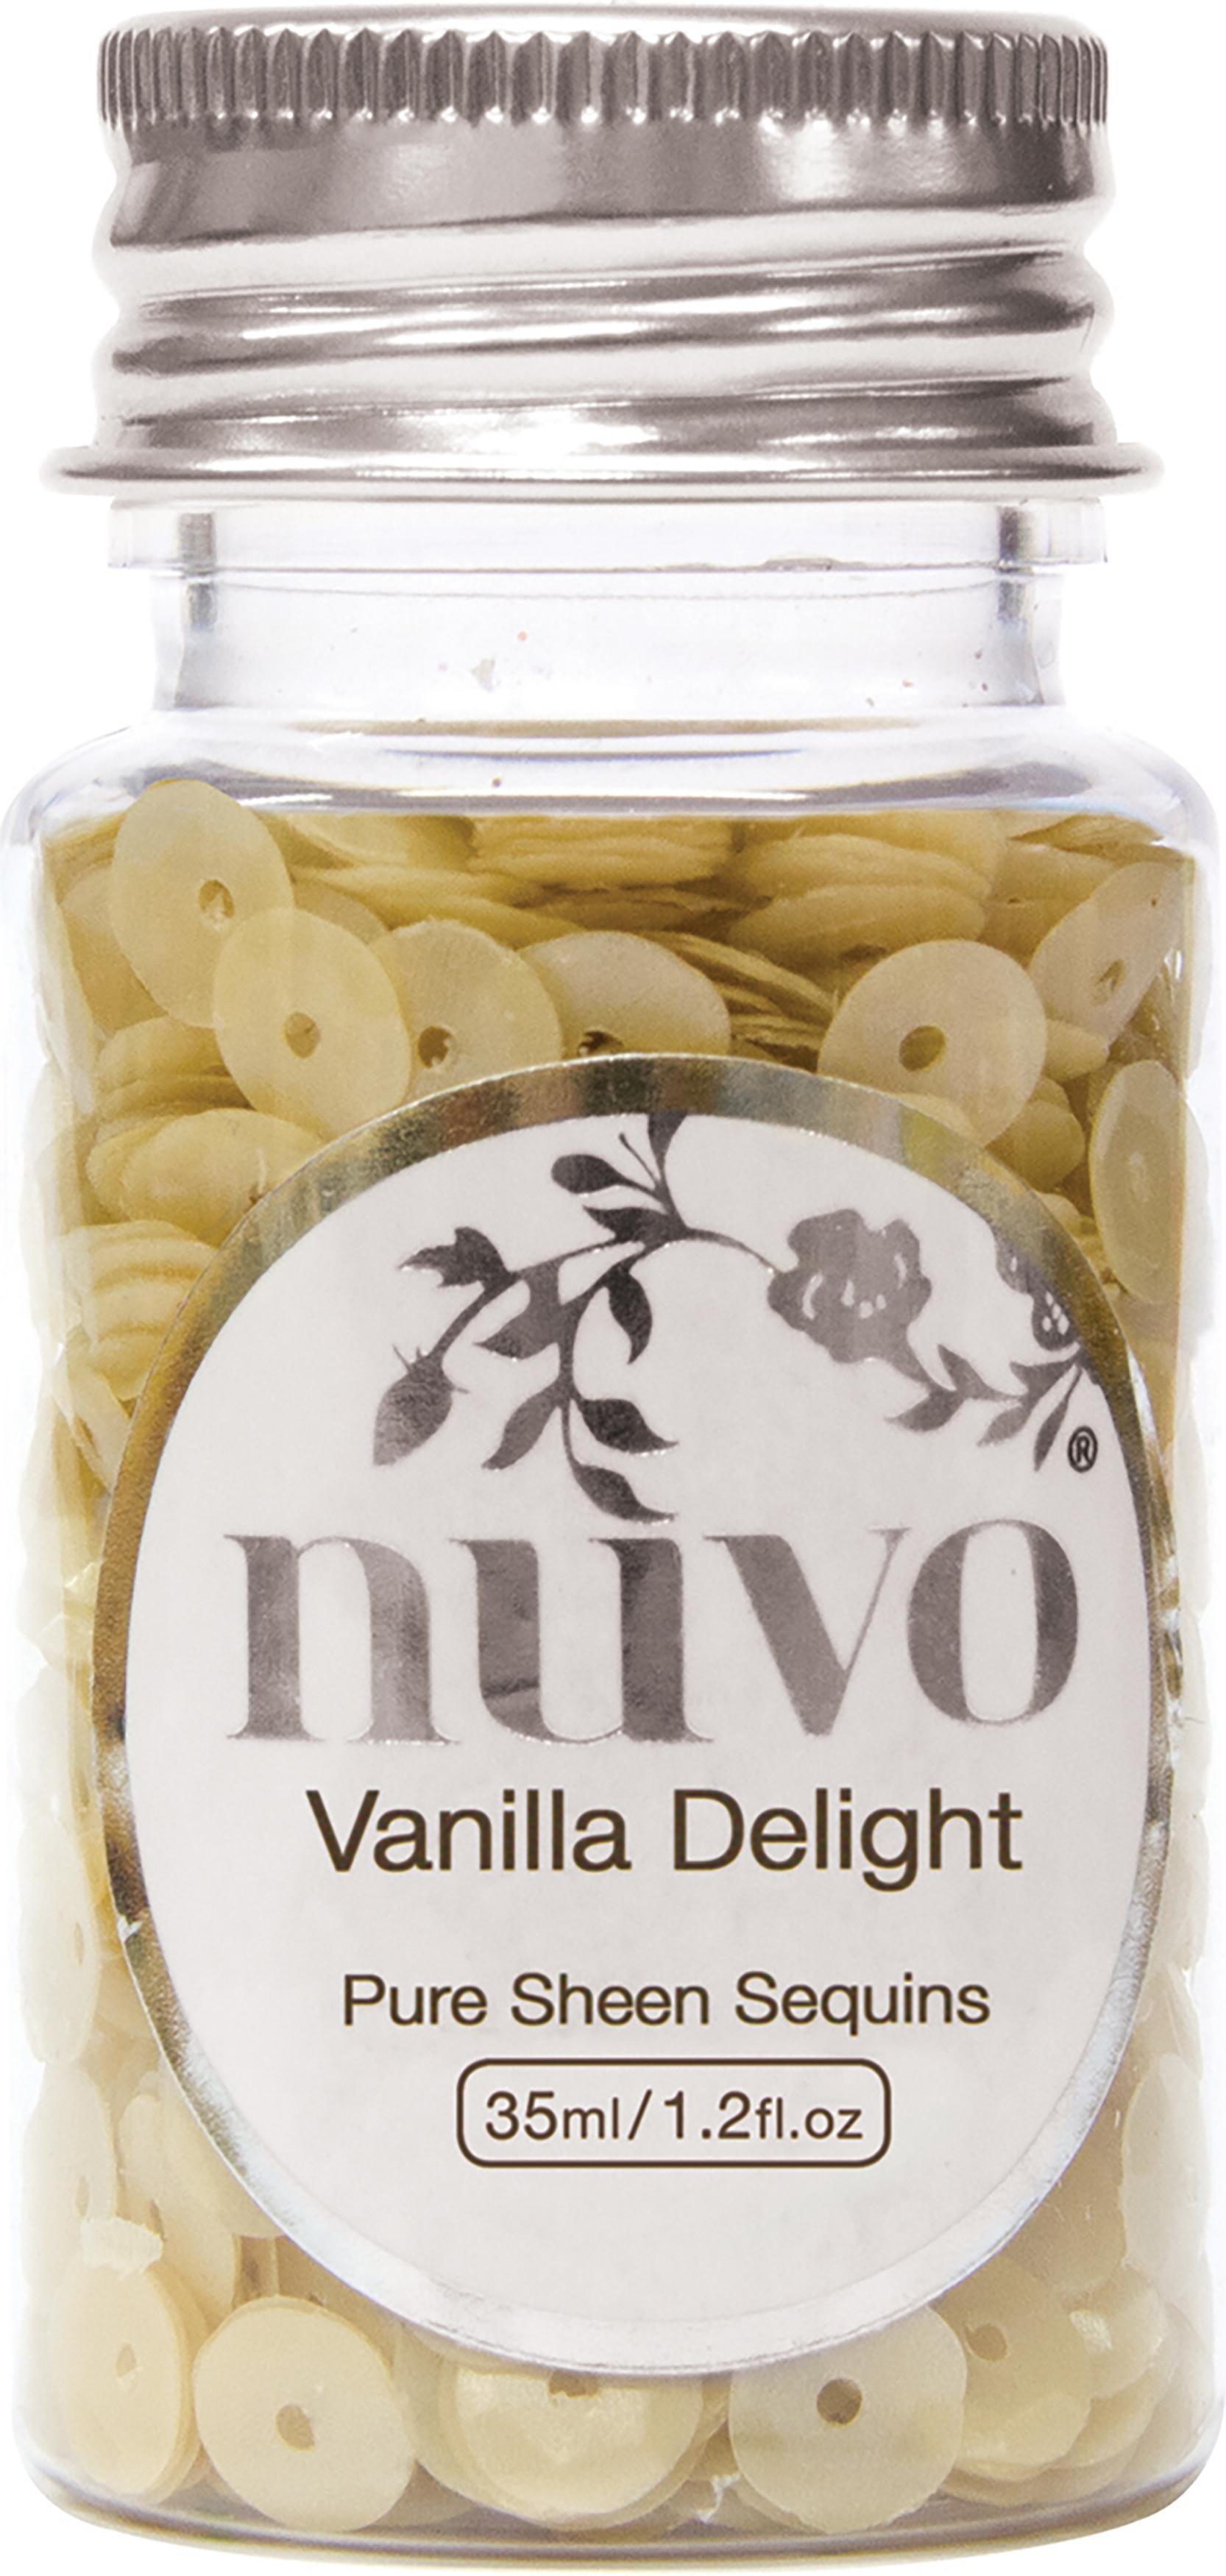 Nuvo Pure Sheen Sequins 1oz-Vanilla Delight